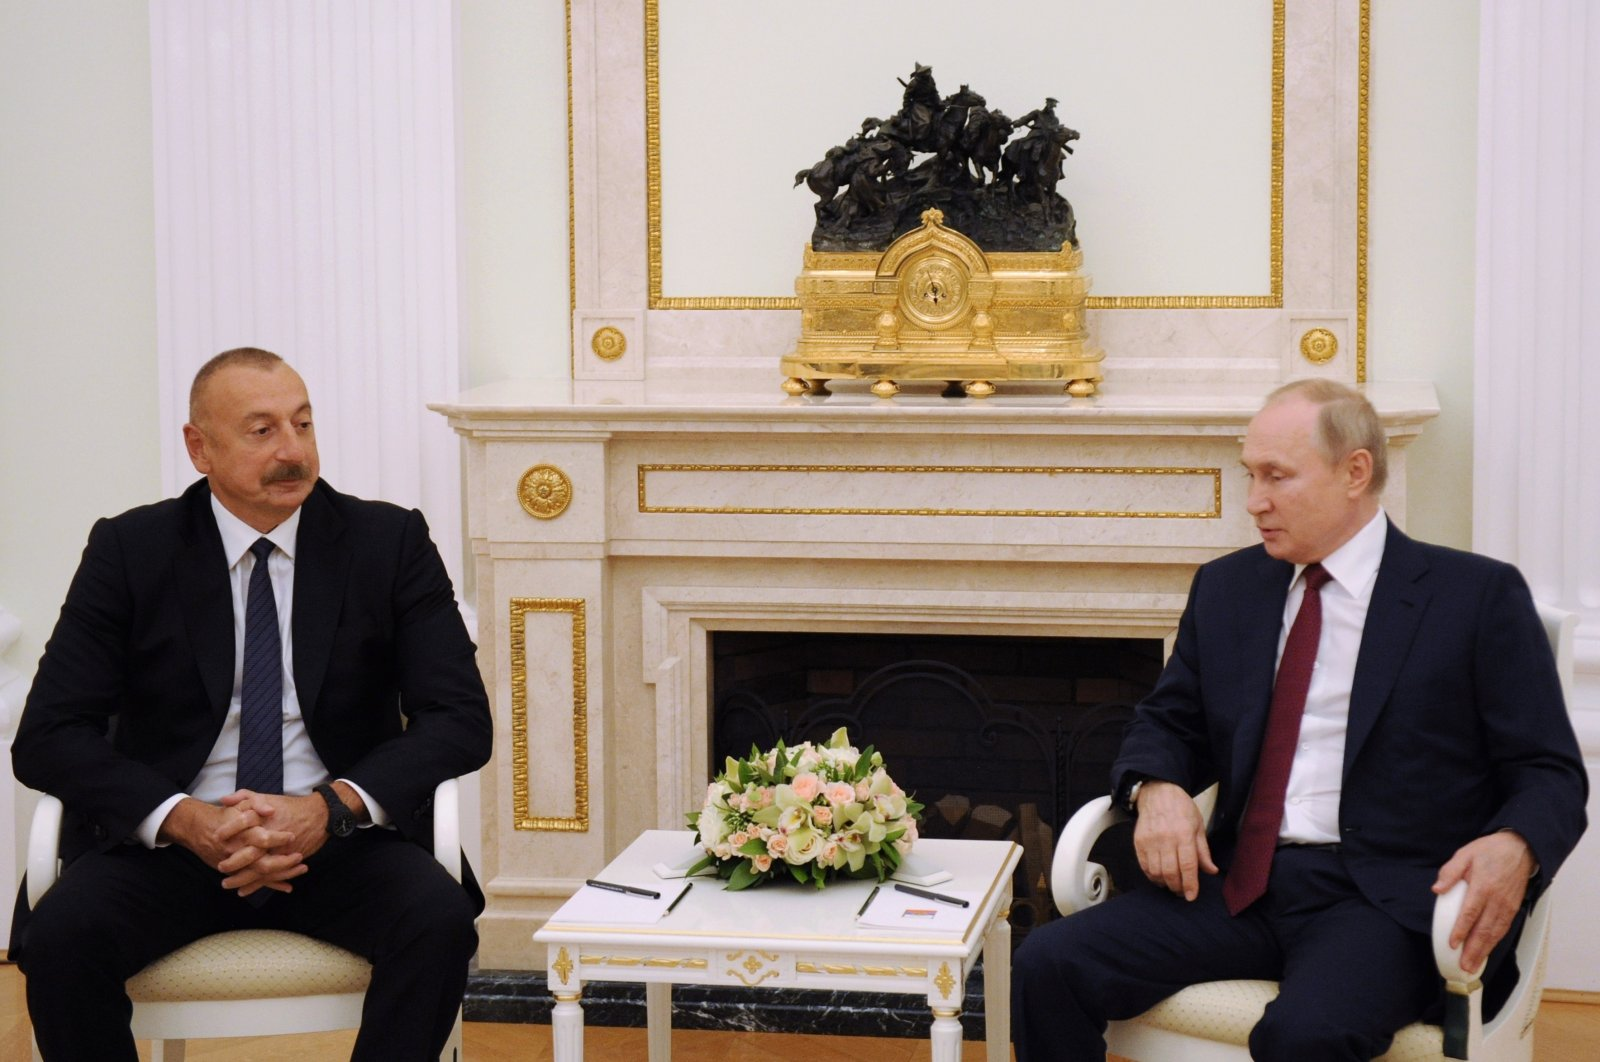 Russian President Vladimir Putin (R) and Azerbaijani President Ilham Aliyev during a meeting at the Kremlin, Moscow, Russia, July 20, 2021. (AP Photo)